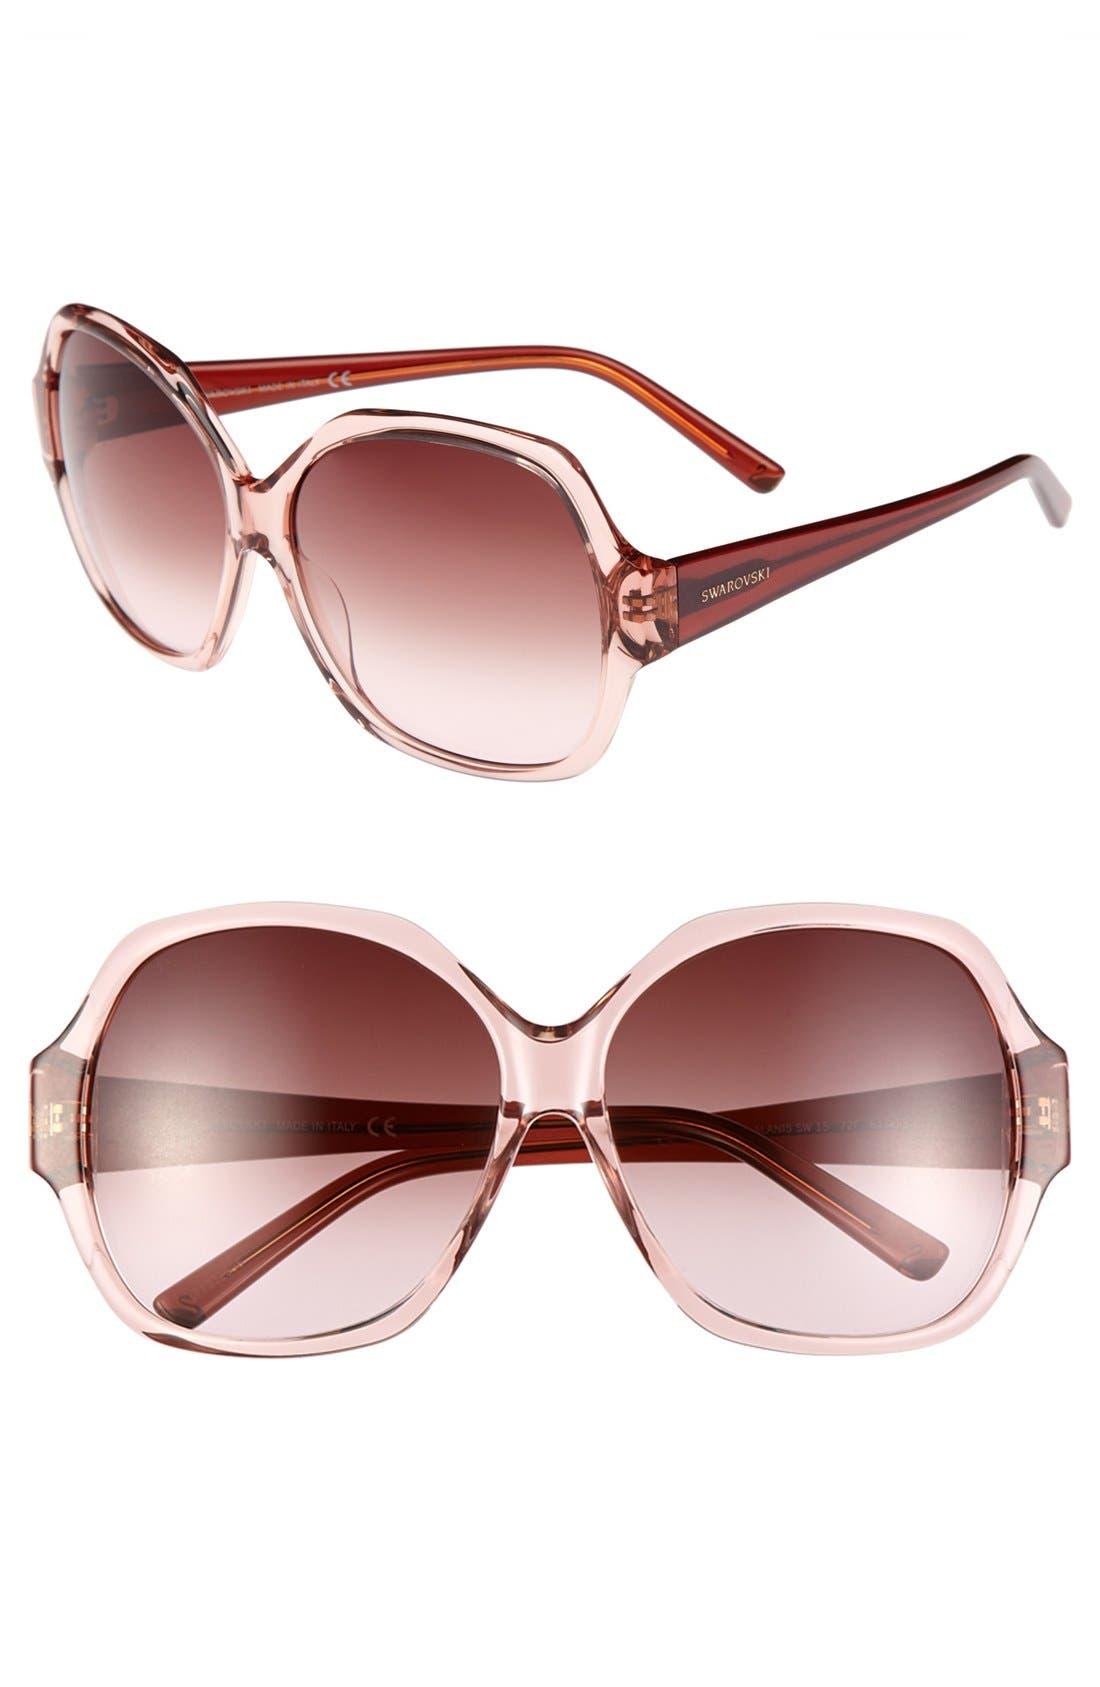 Main Image - Swarovski 61mm Oversized Sunglasses